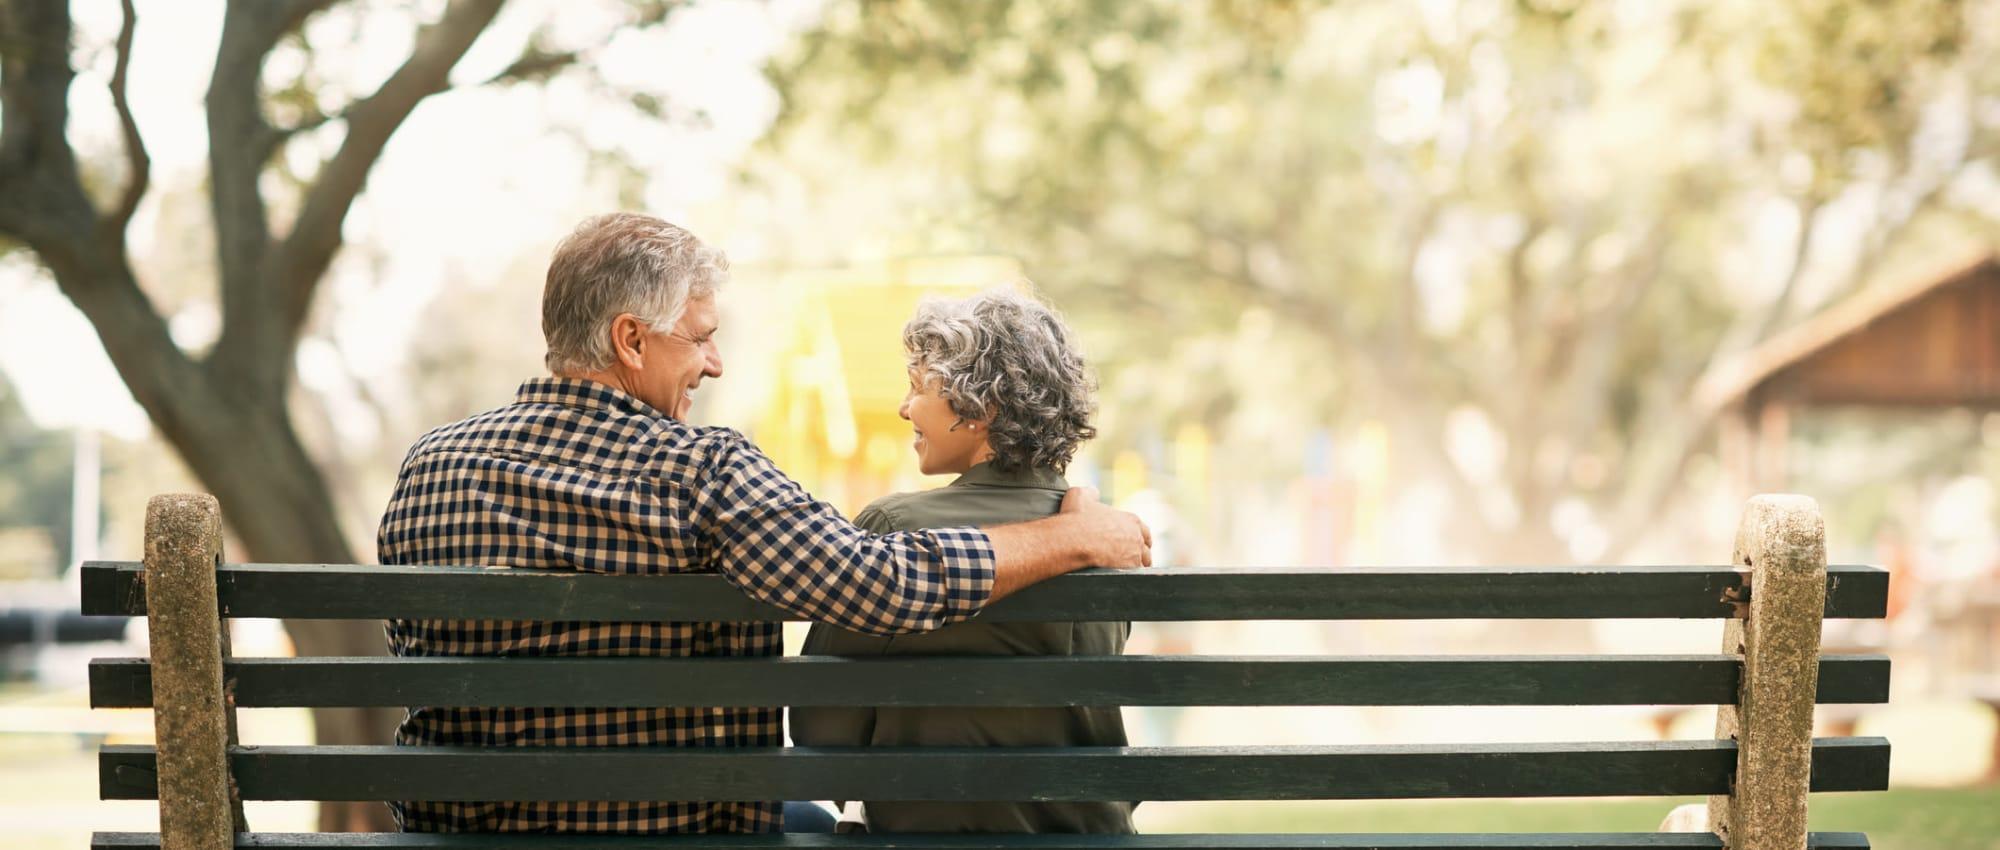 News at Milestone Senior Living in Faribault, Minnesota.